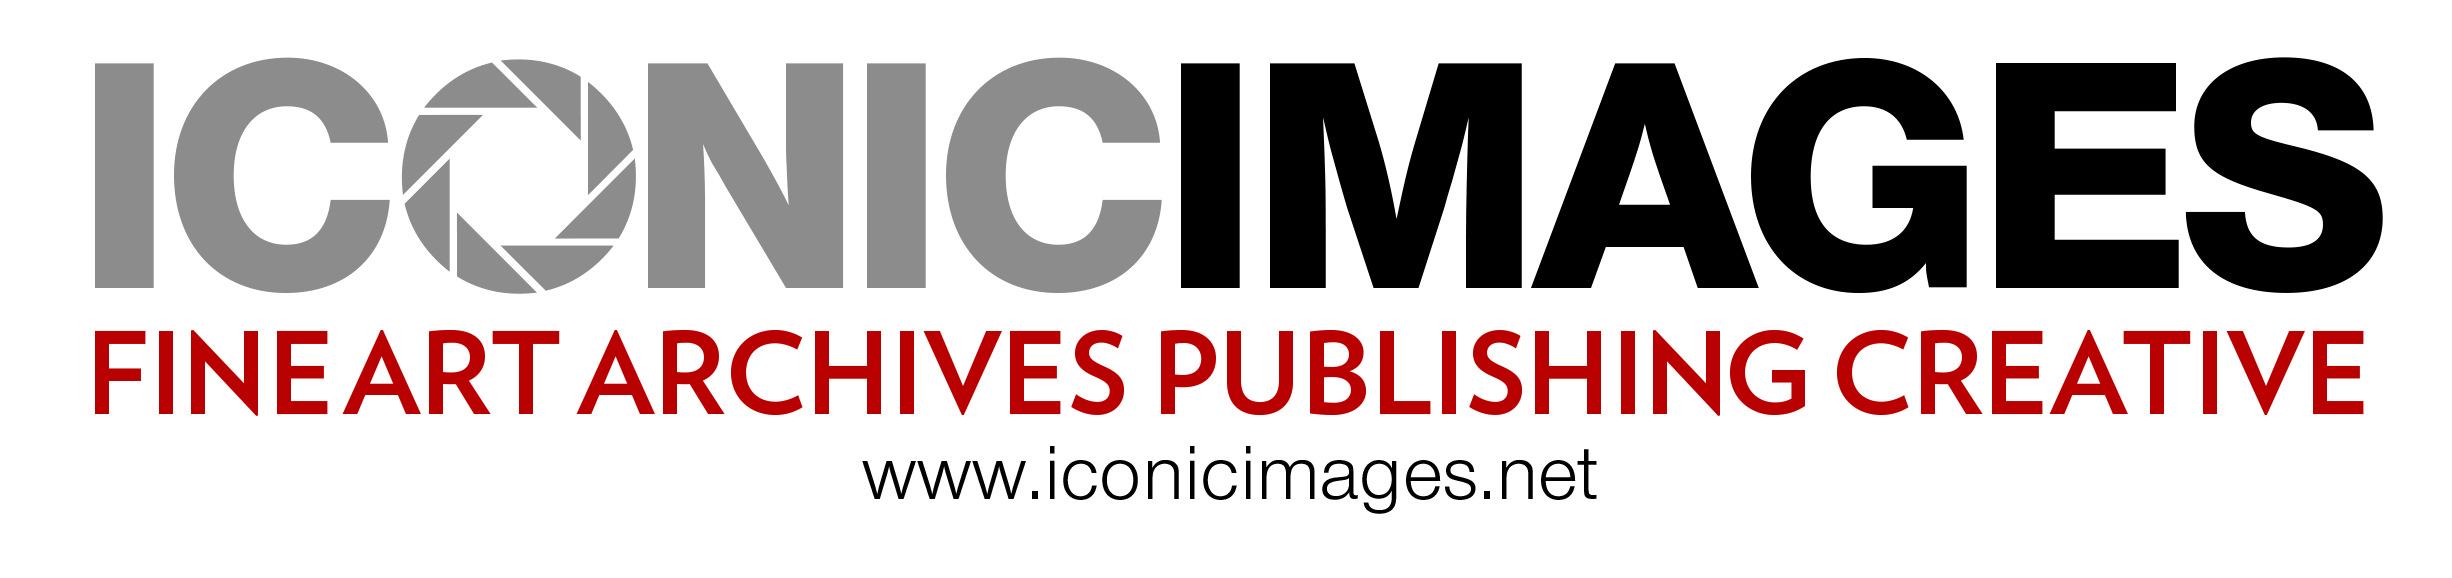 IconicImages_Website